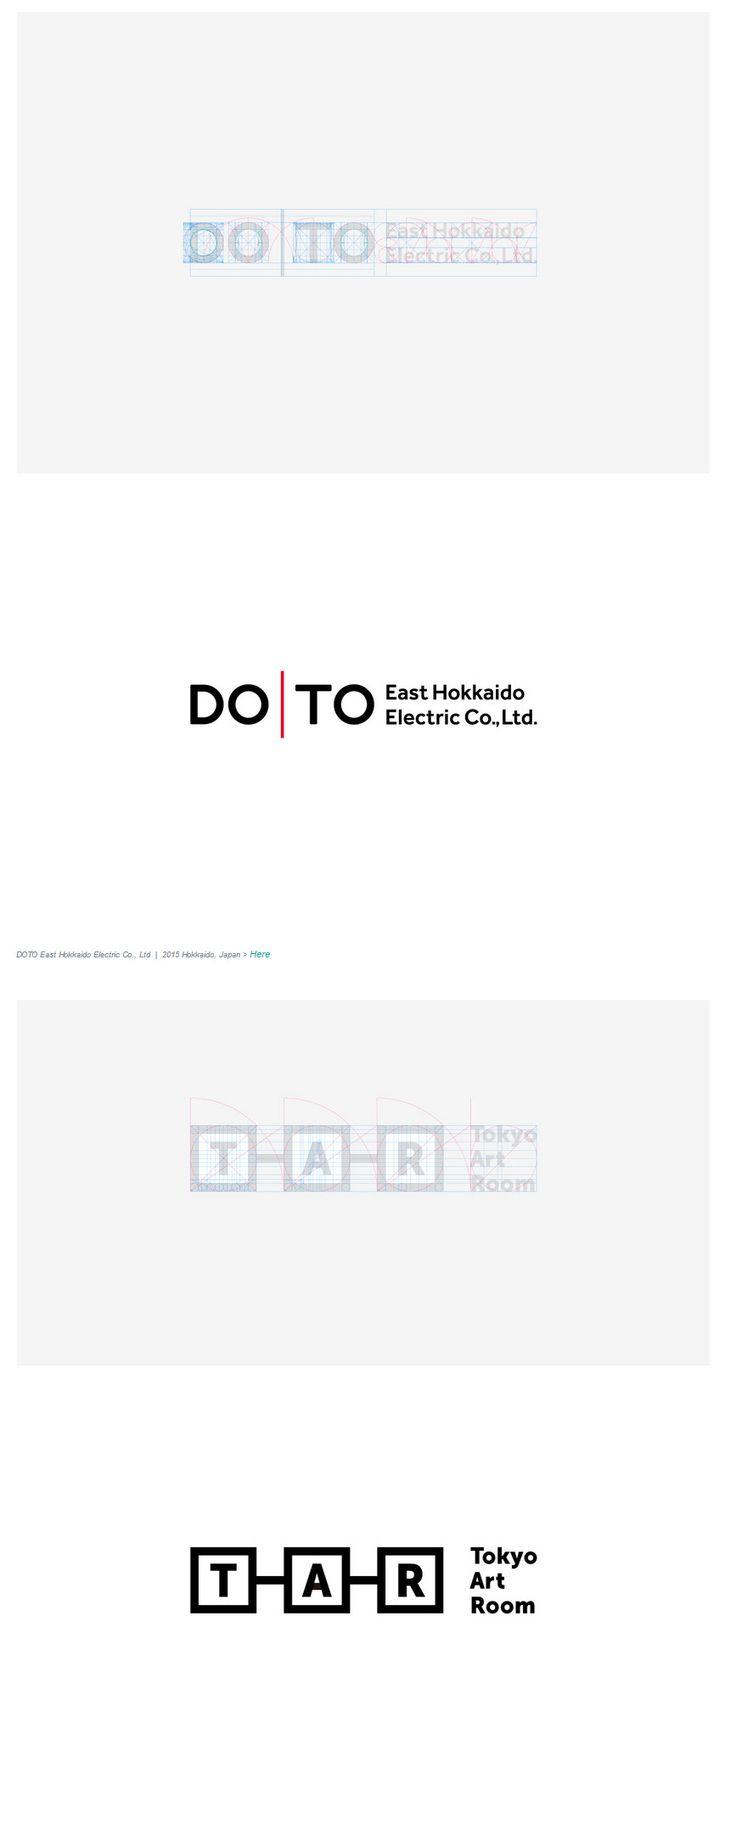 Grid of logos https://www.behance.net/gallery/19712547/Grid-and-logos-1